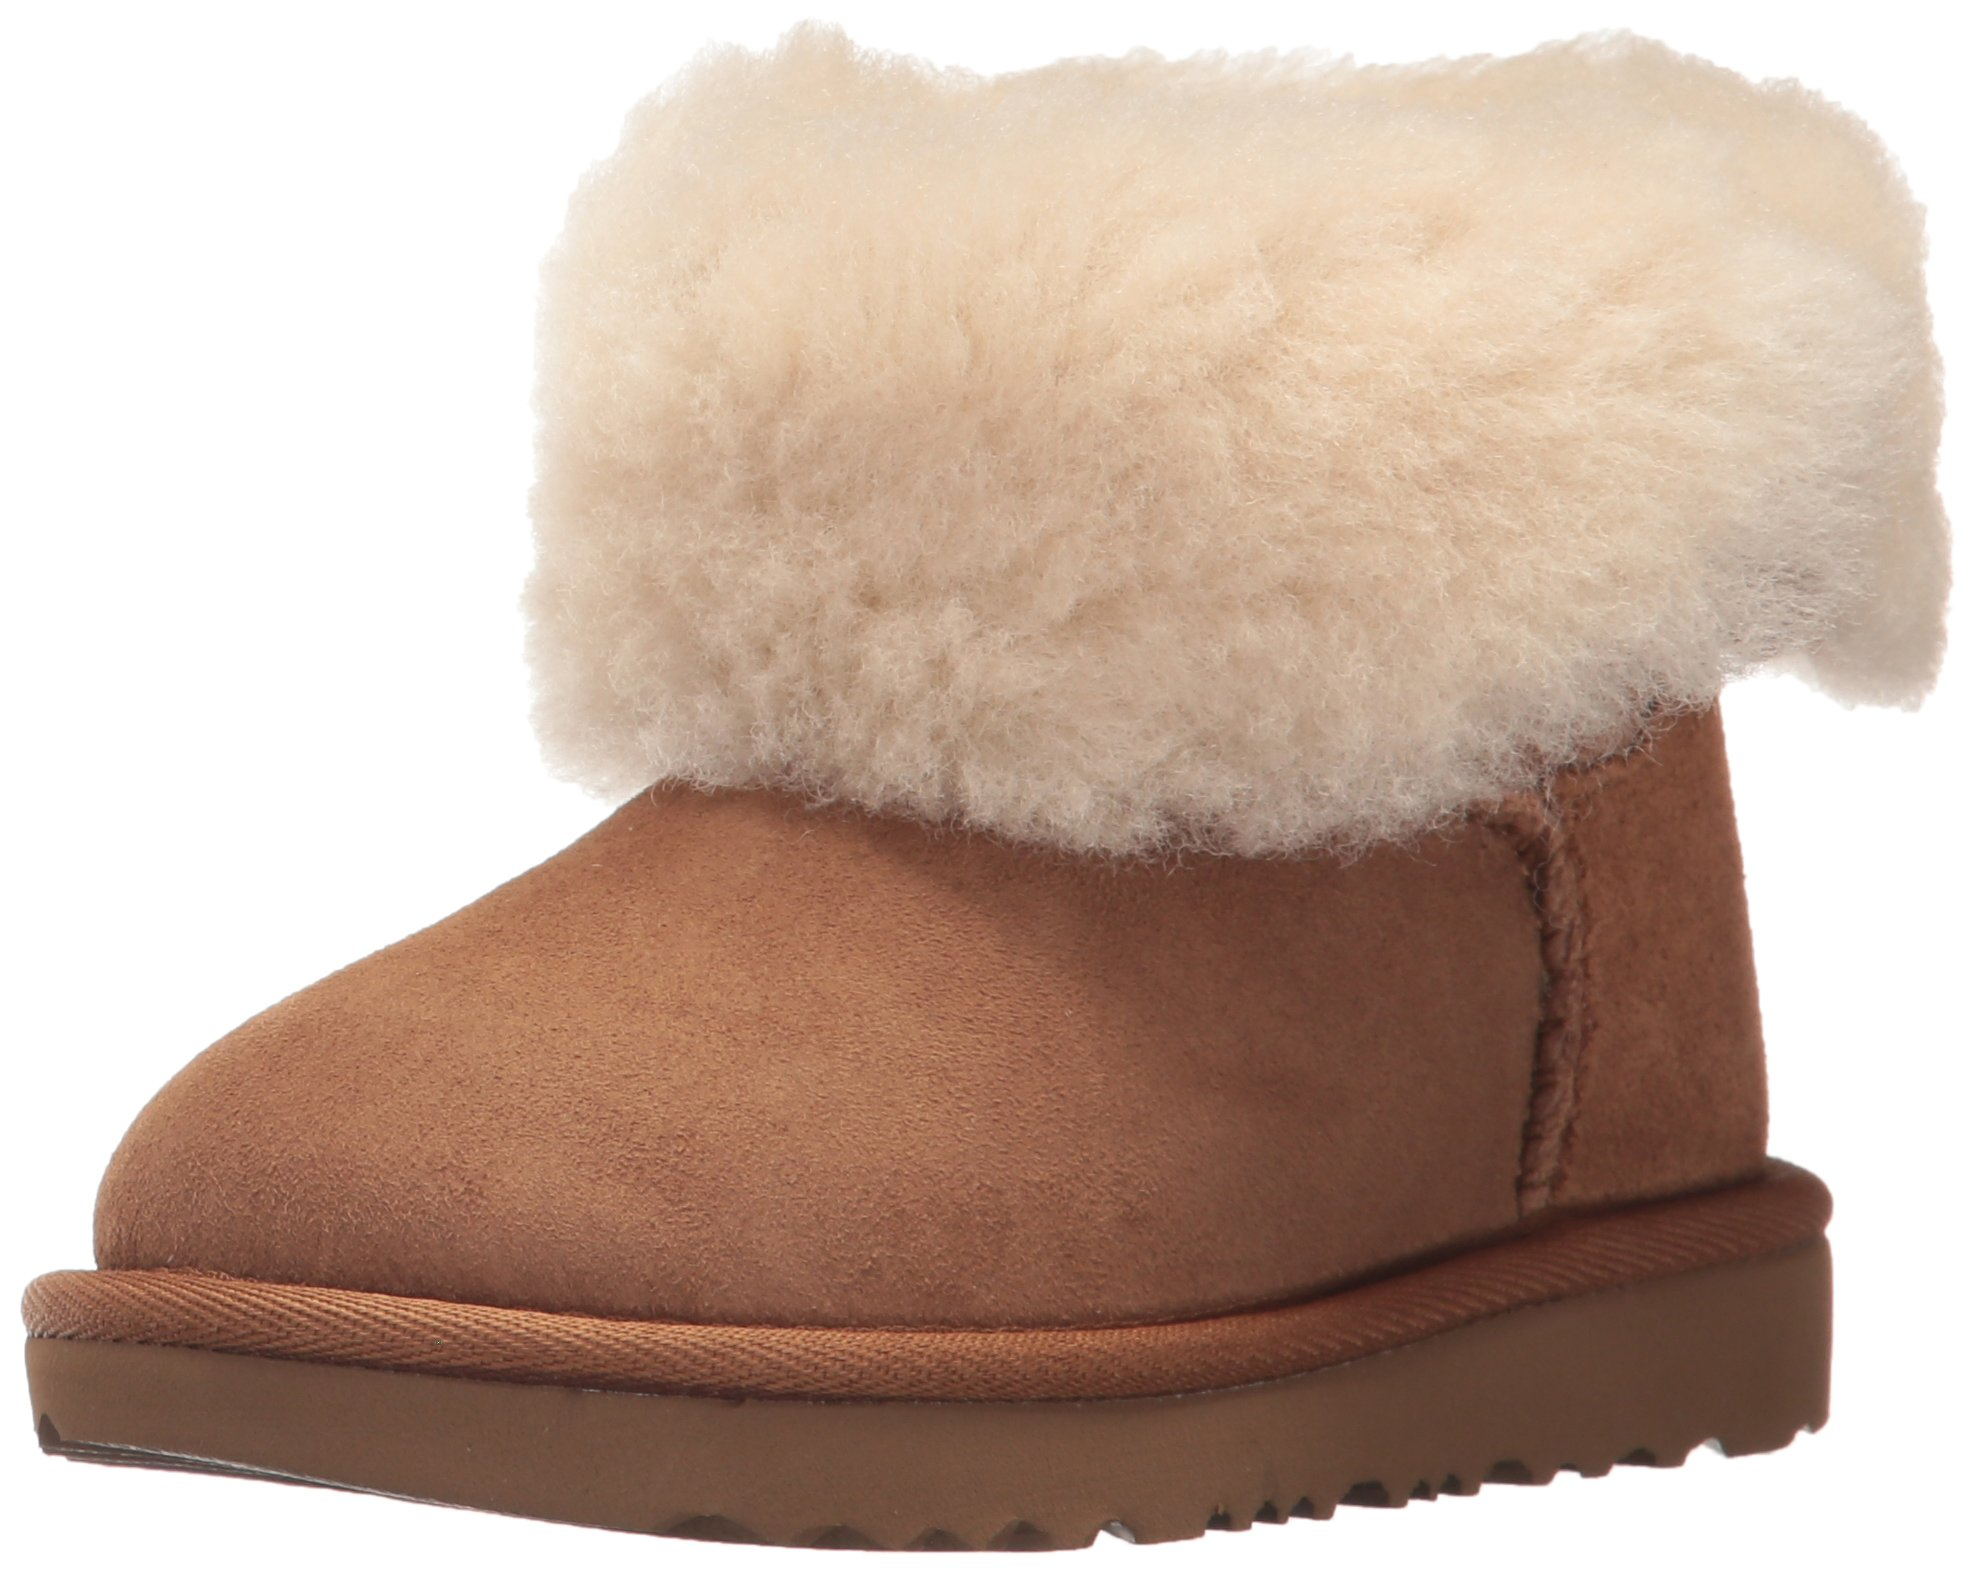 UGG Girls T Bailey Button II Fashion Boot, Chestnut, 6 M US Toddler